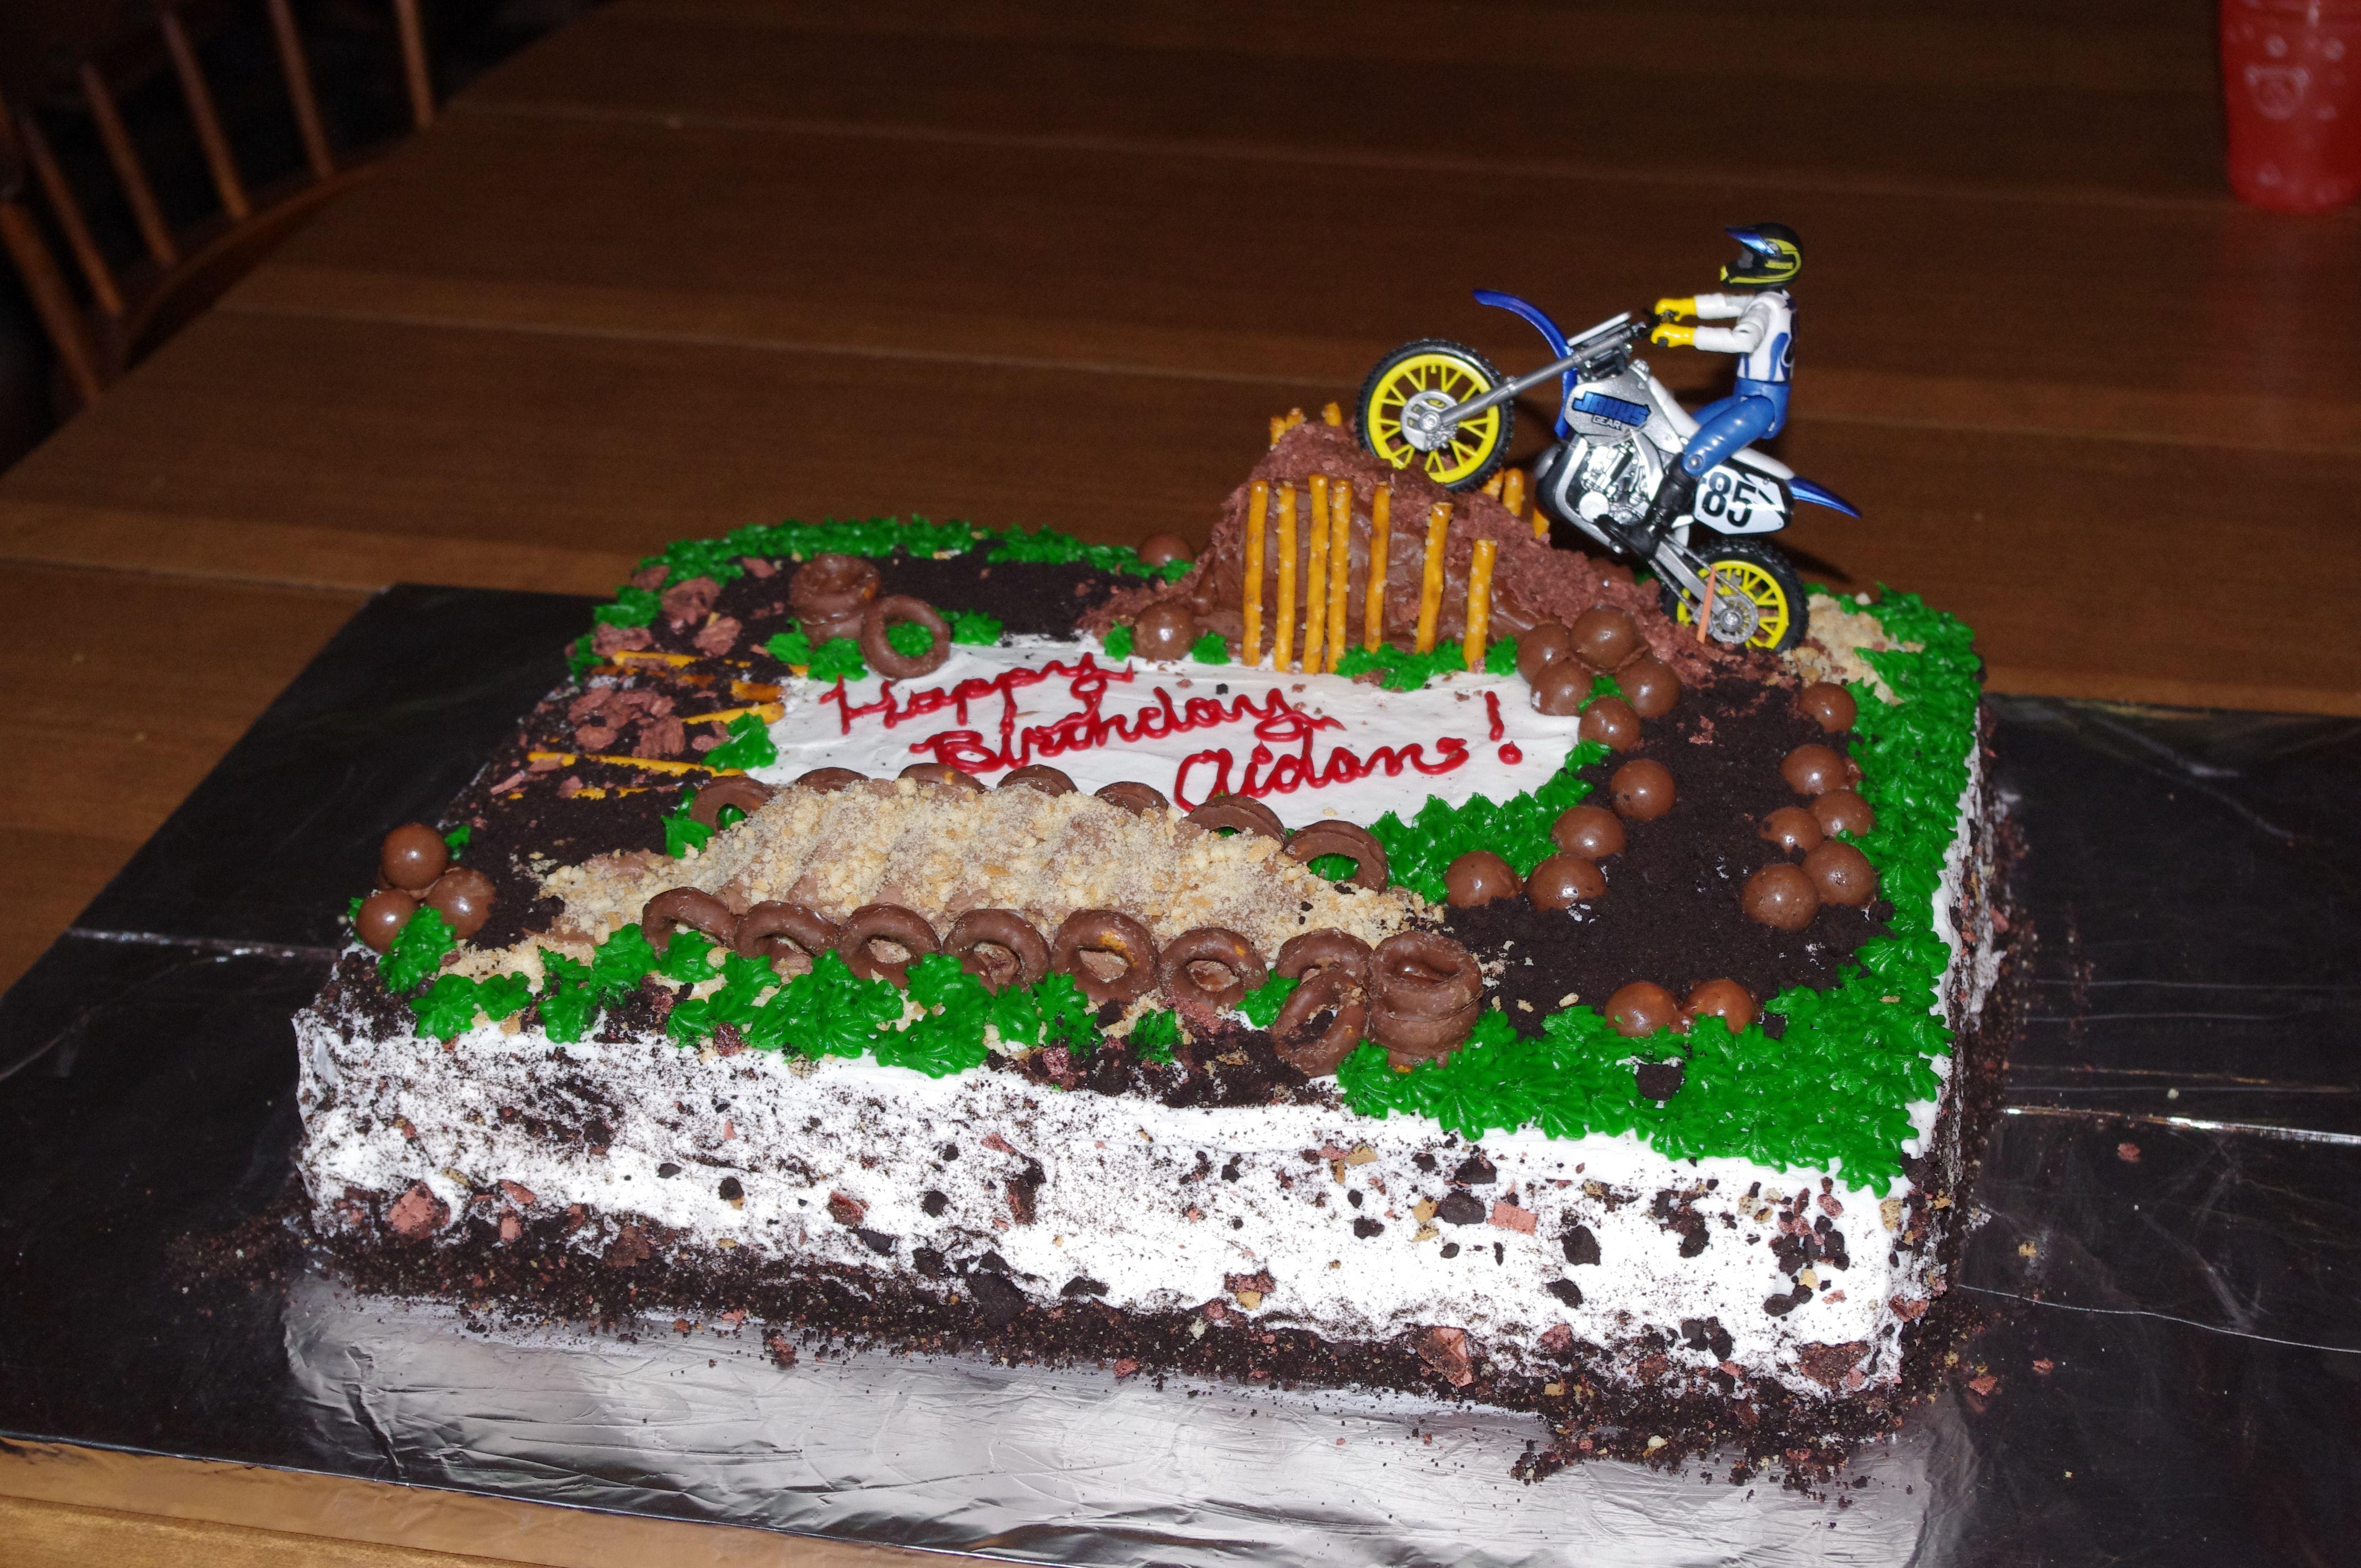 dirt bike cake - photo #37